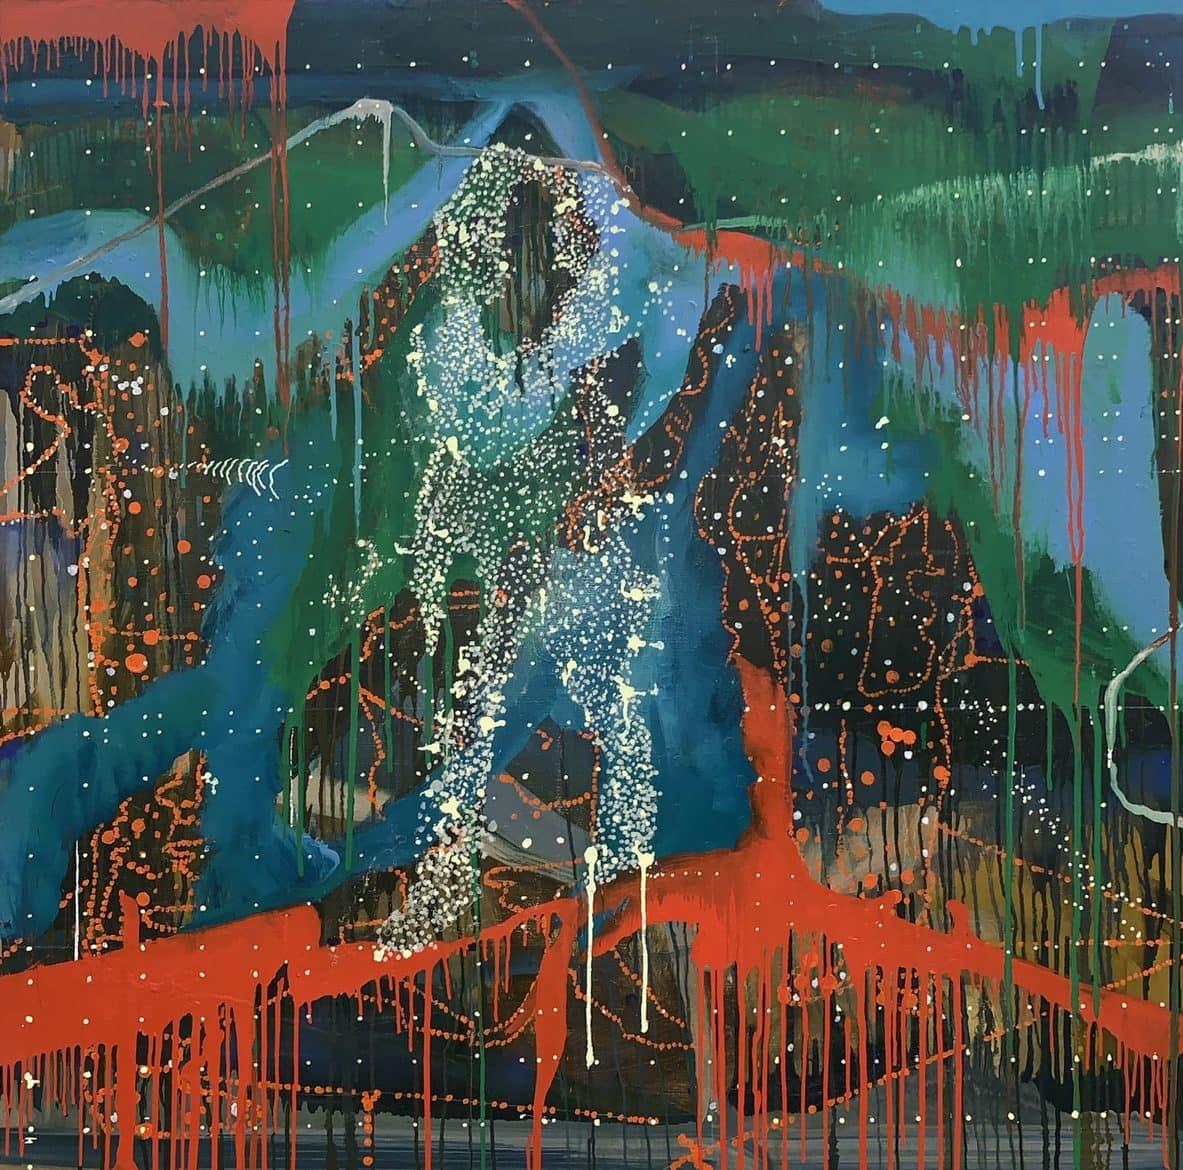 Jon Cattapan, 'The Chancer', 2017, Oil and acrylic on linen, 100 x 100cm